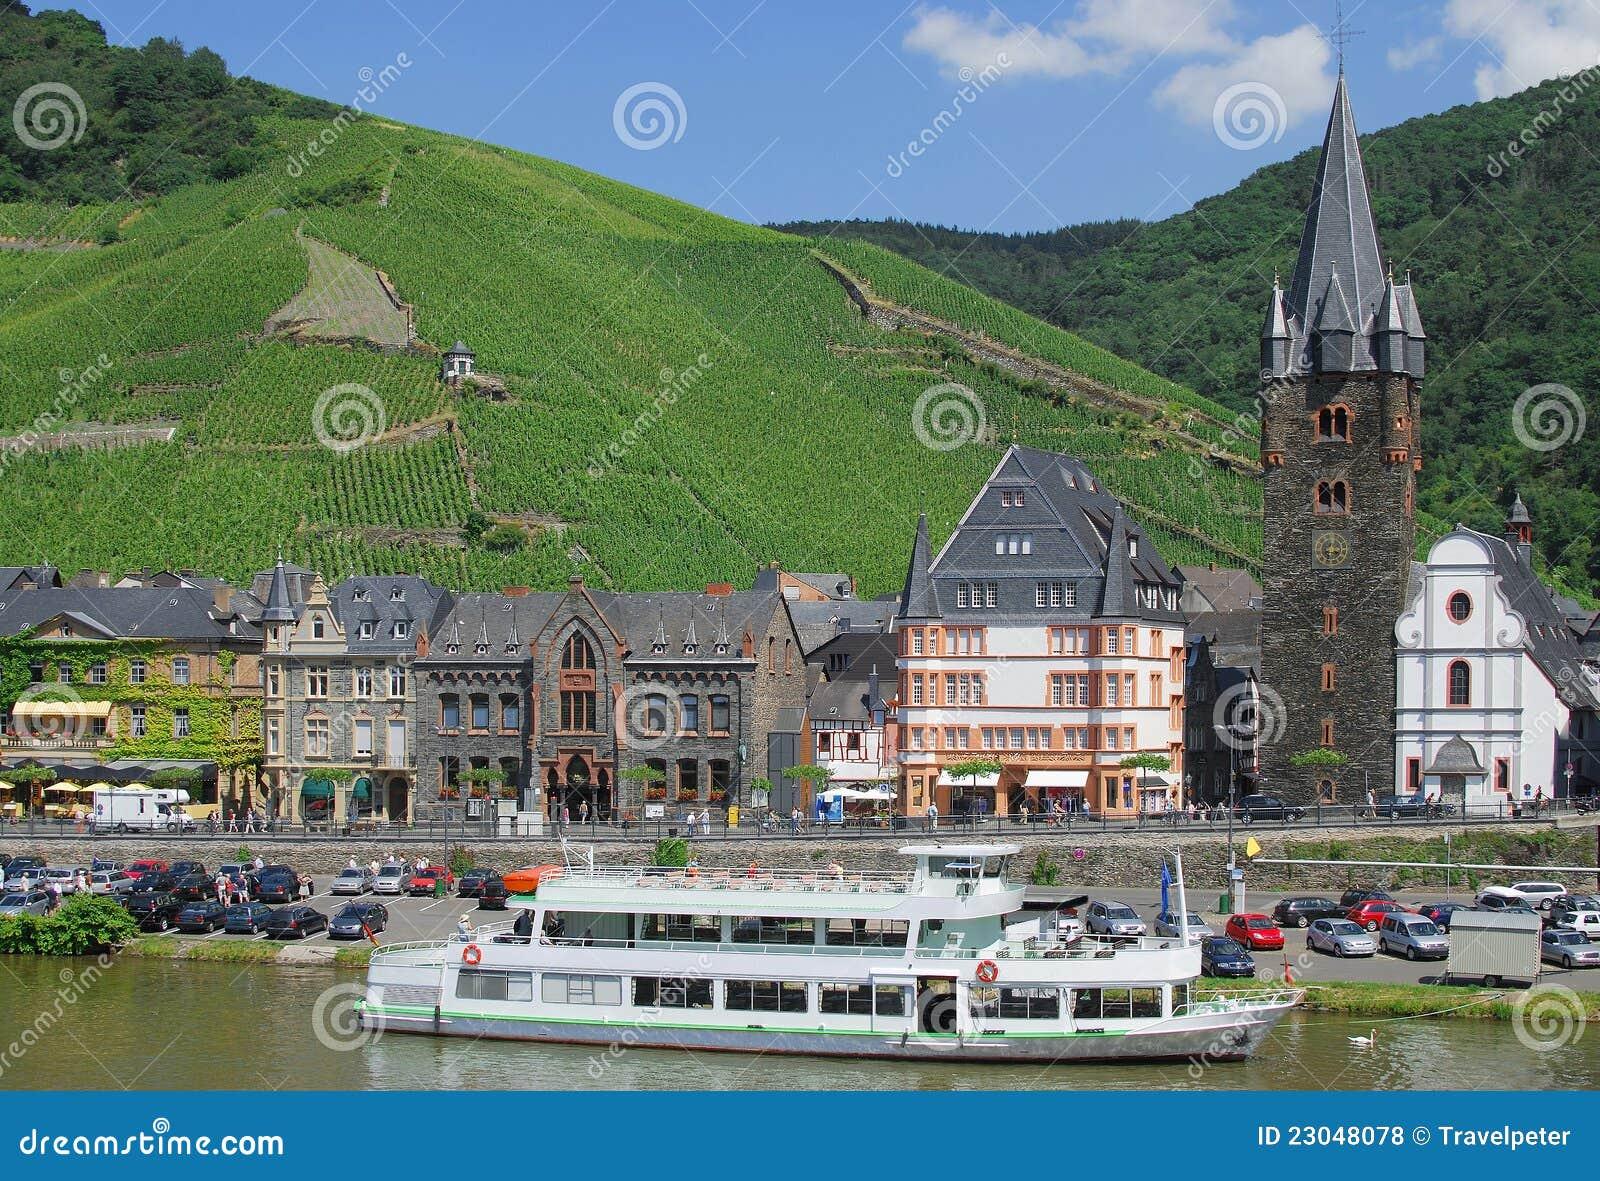 Bernkastel Kues, Rivier Moezel, Duitsland Royalty vrije Stock Foto u0026#39;s   Afbeelding  23048078